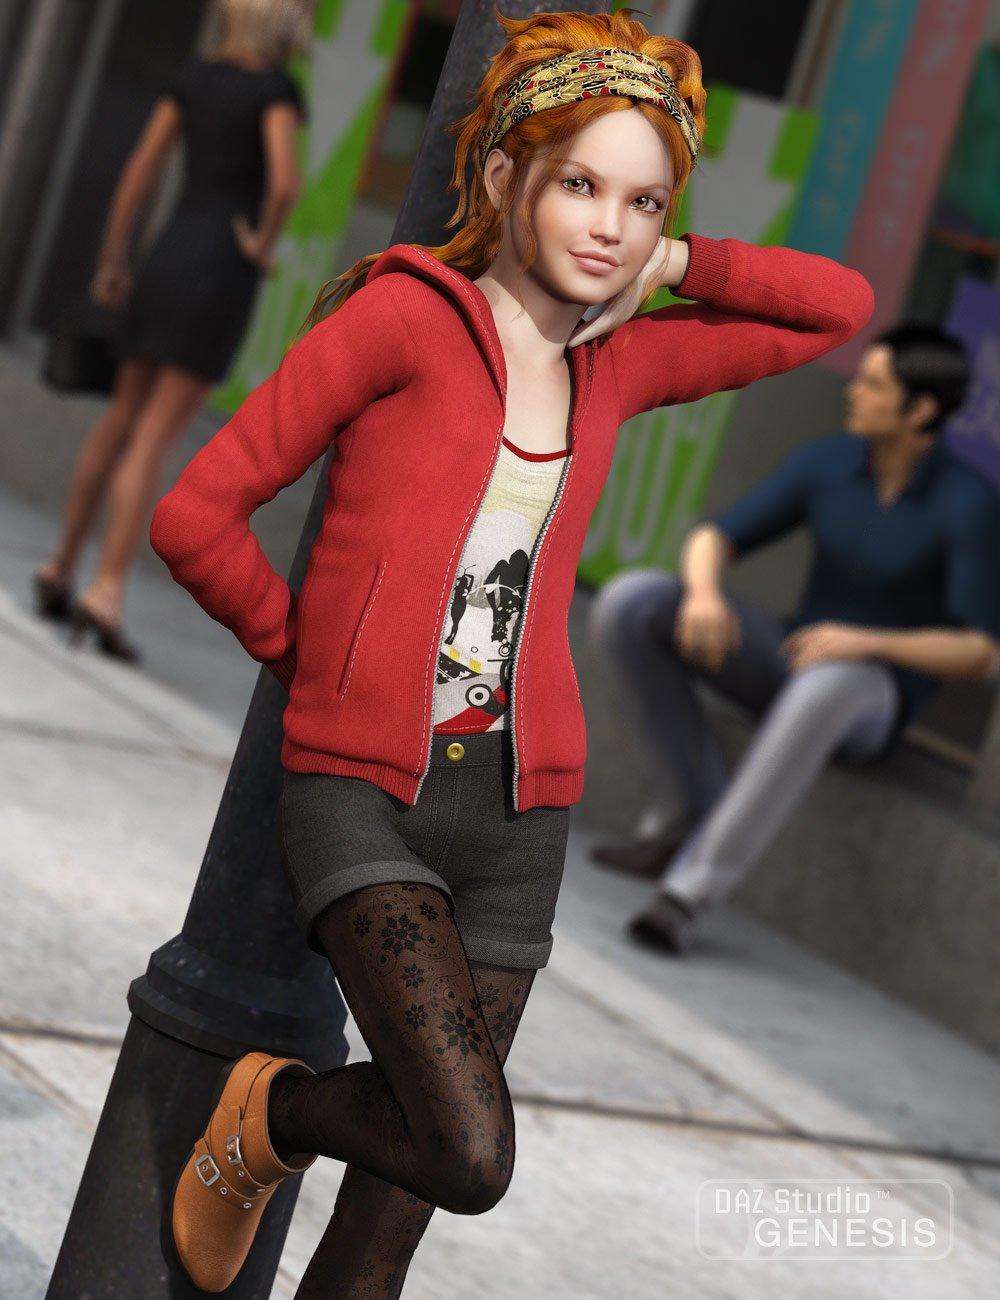 Mall Girl for Genesis by: Dogz, 3D Models by Daz 3D